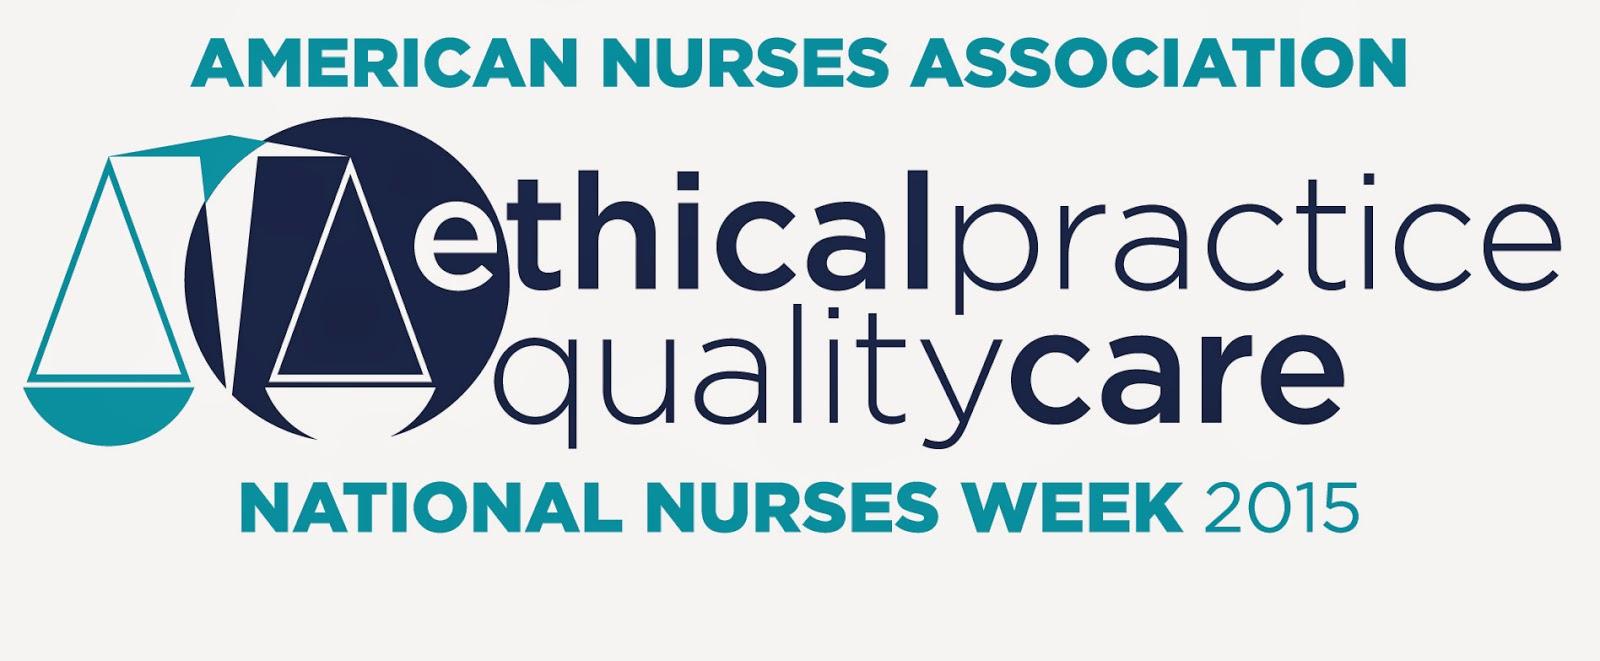 nurses week logo 2015